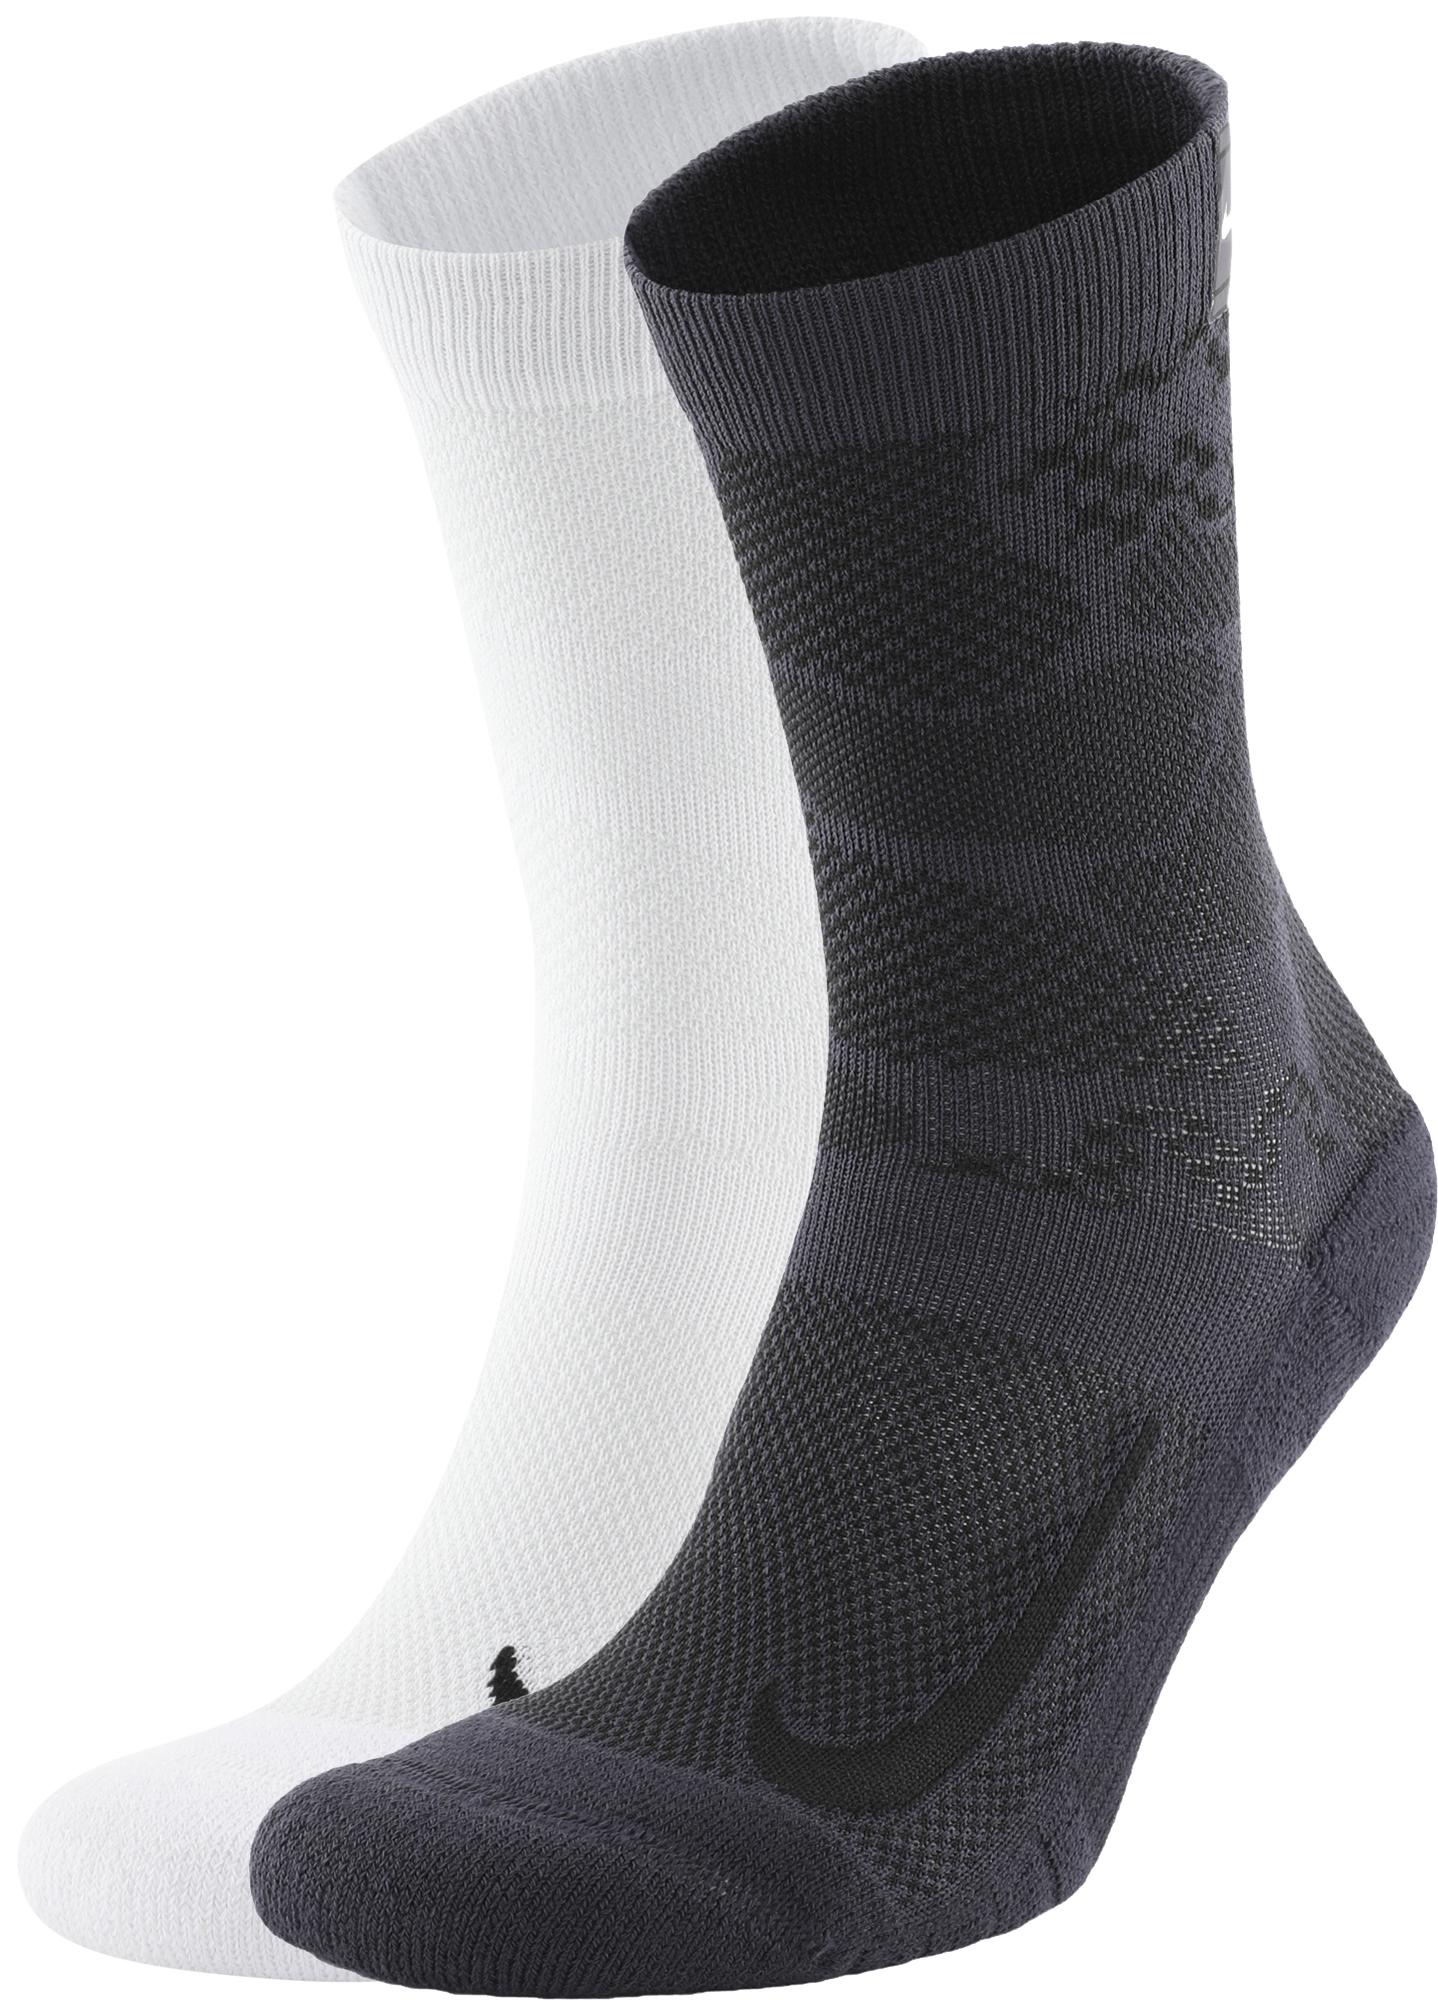 Носки Nike Court Multiplier Max, 2 пары, размер 33-37 недорого